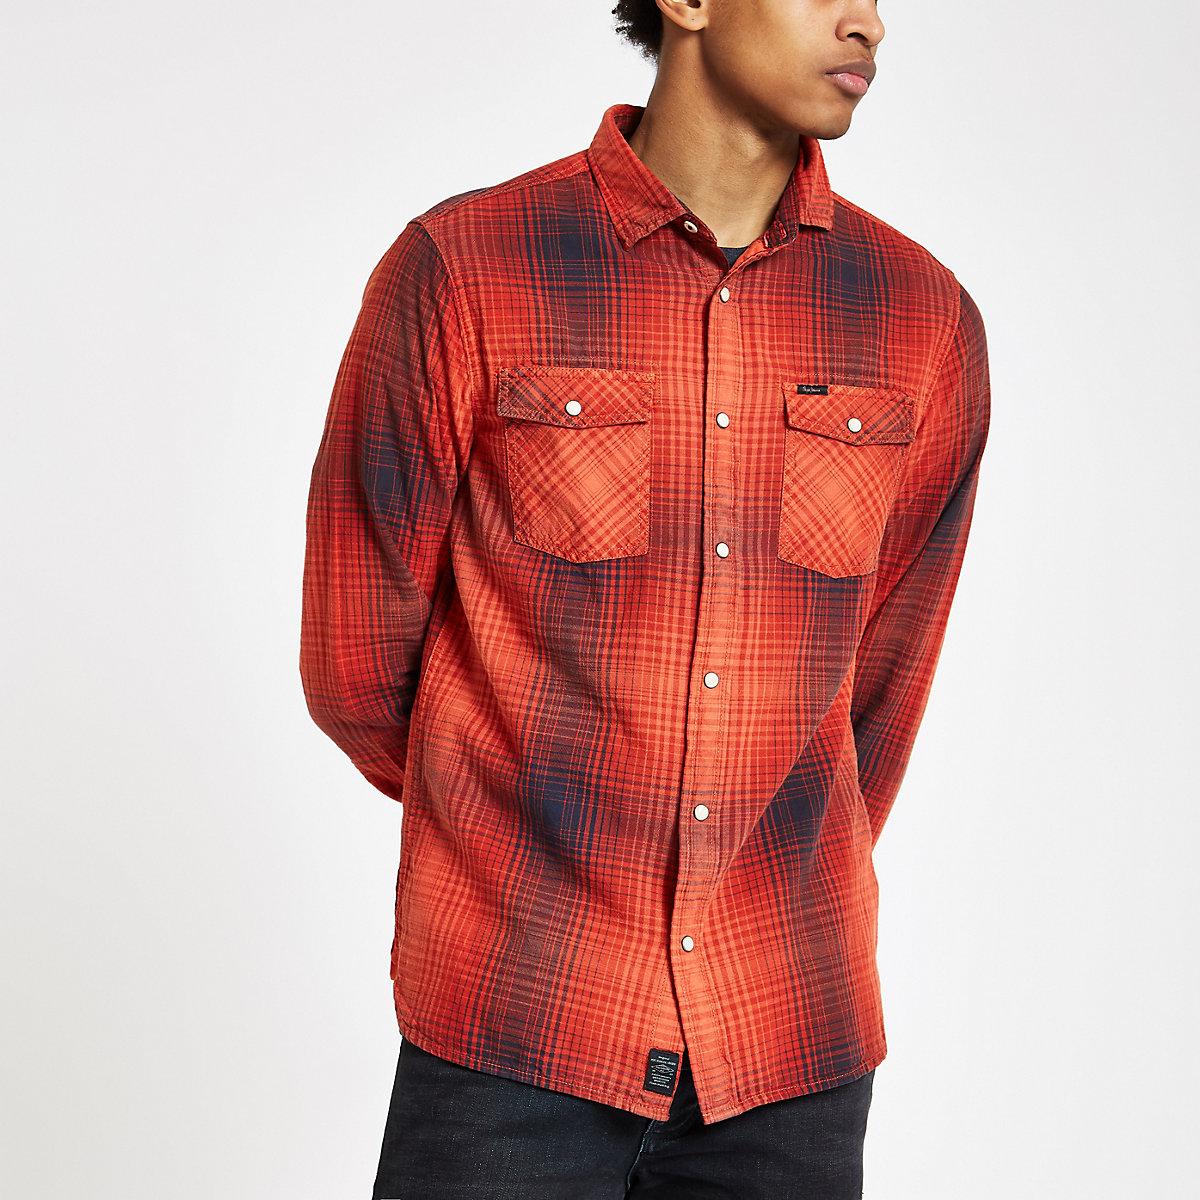 Pepe Jeans – Rotes, kariertes Button-Down-Hemd - Langärmelige Hemden ... 59b42765cc